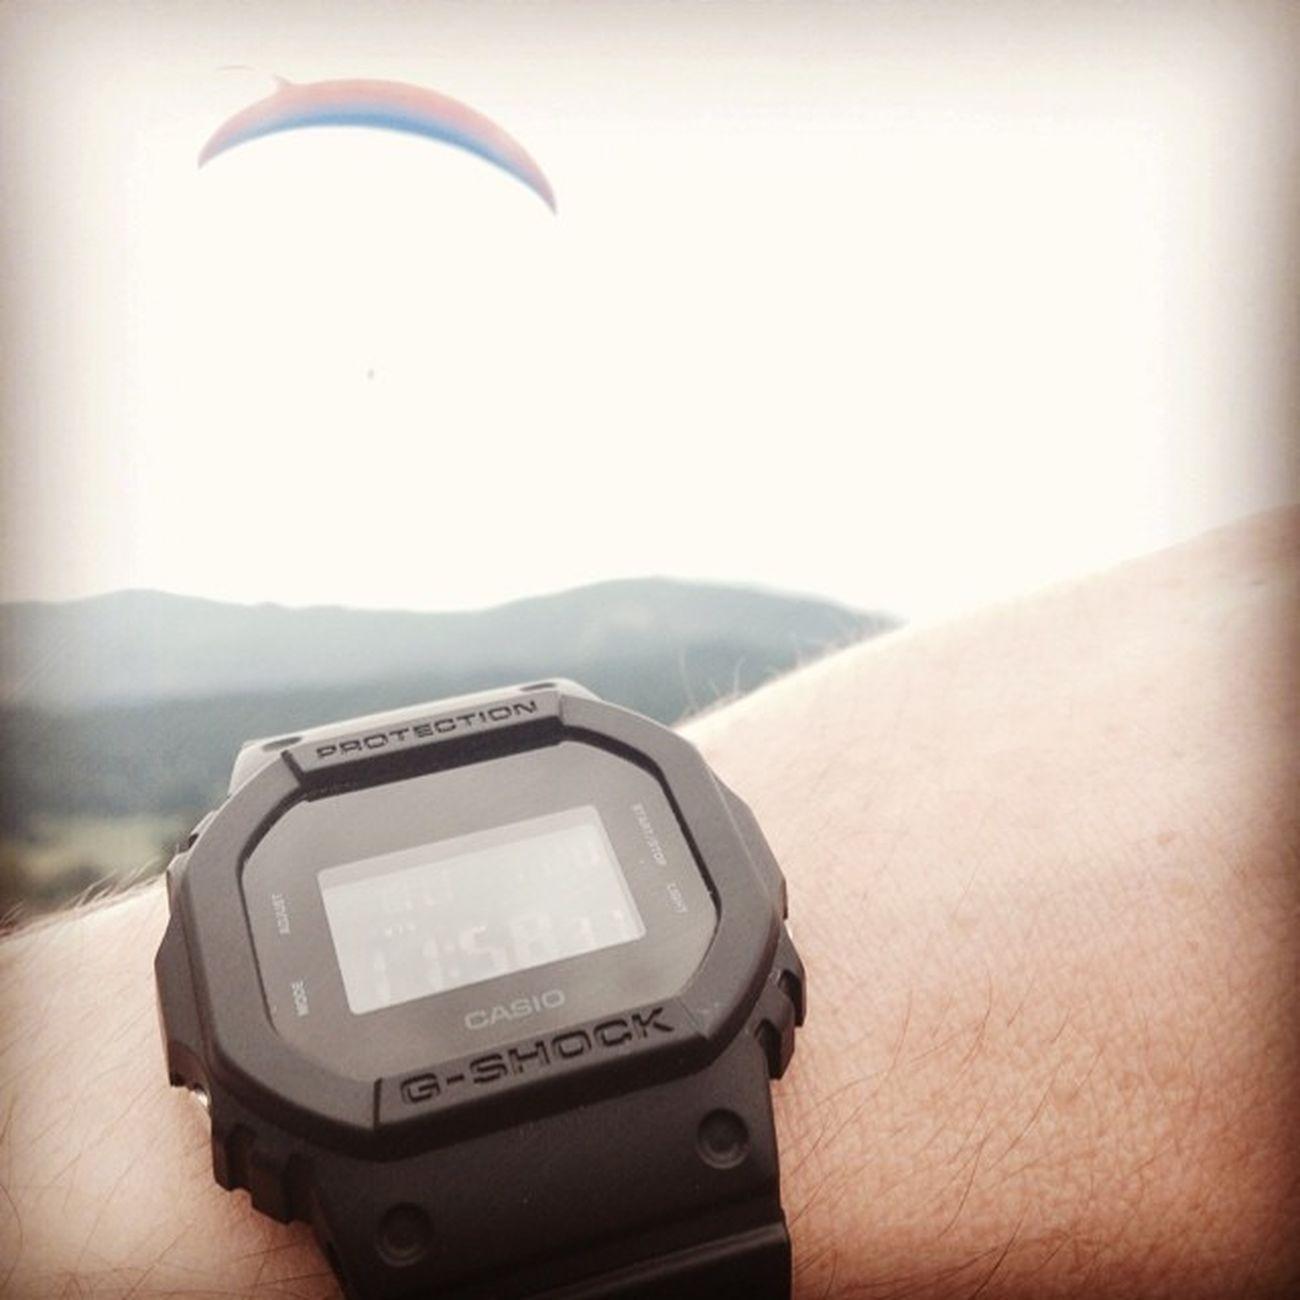 Casio Gshock Dw5600bb Parapente Paragliding Instaaction Instawatches NOVA Dw5600 -bb